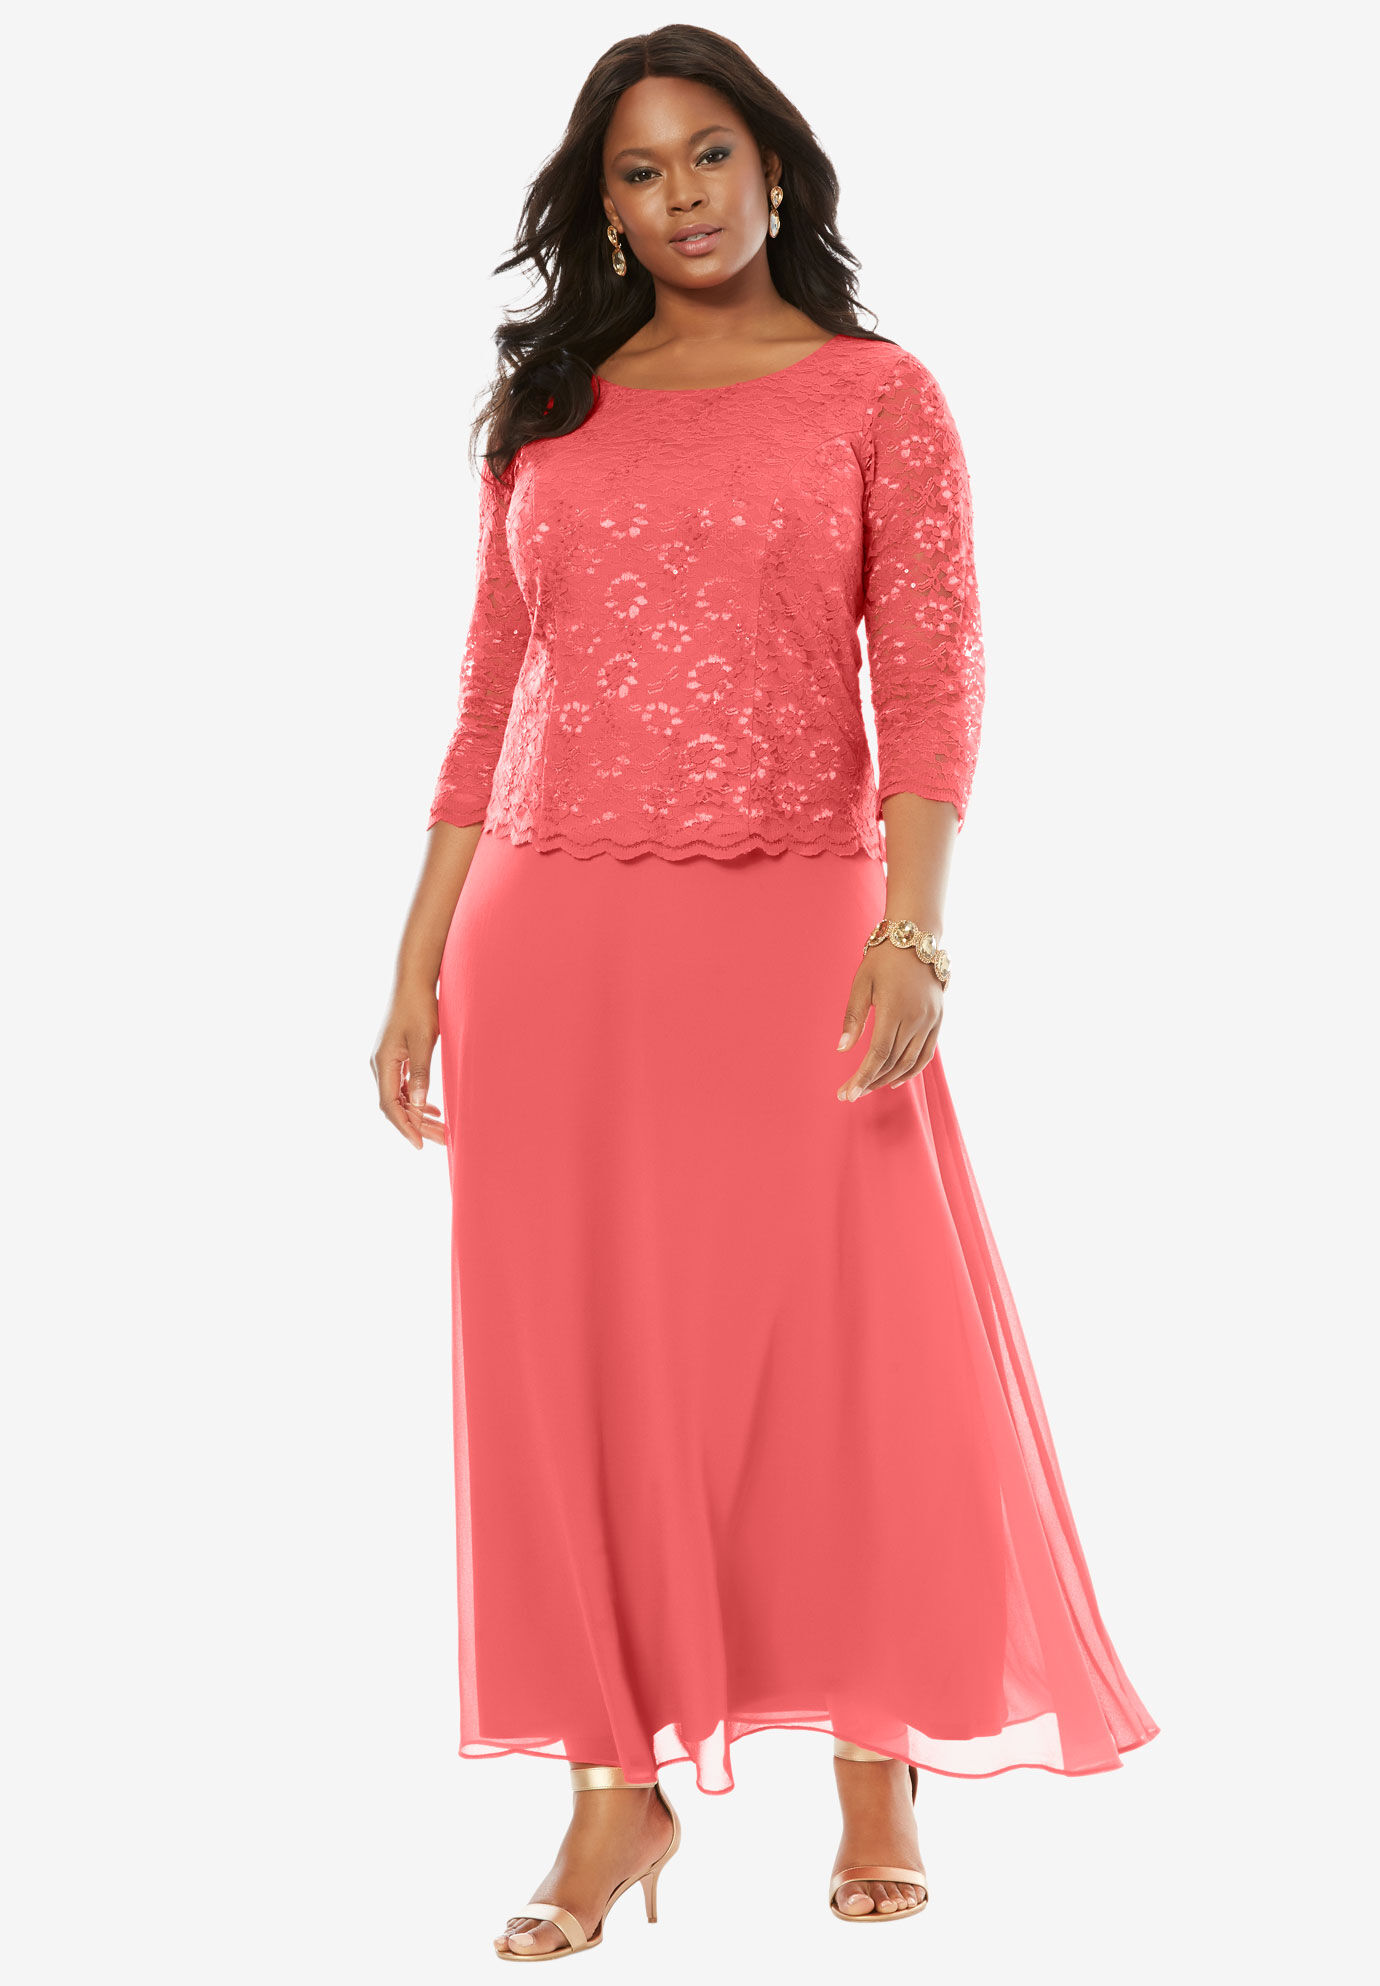 Plus Size Evening Dress for Women